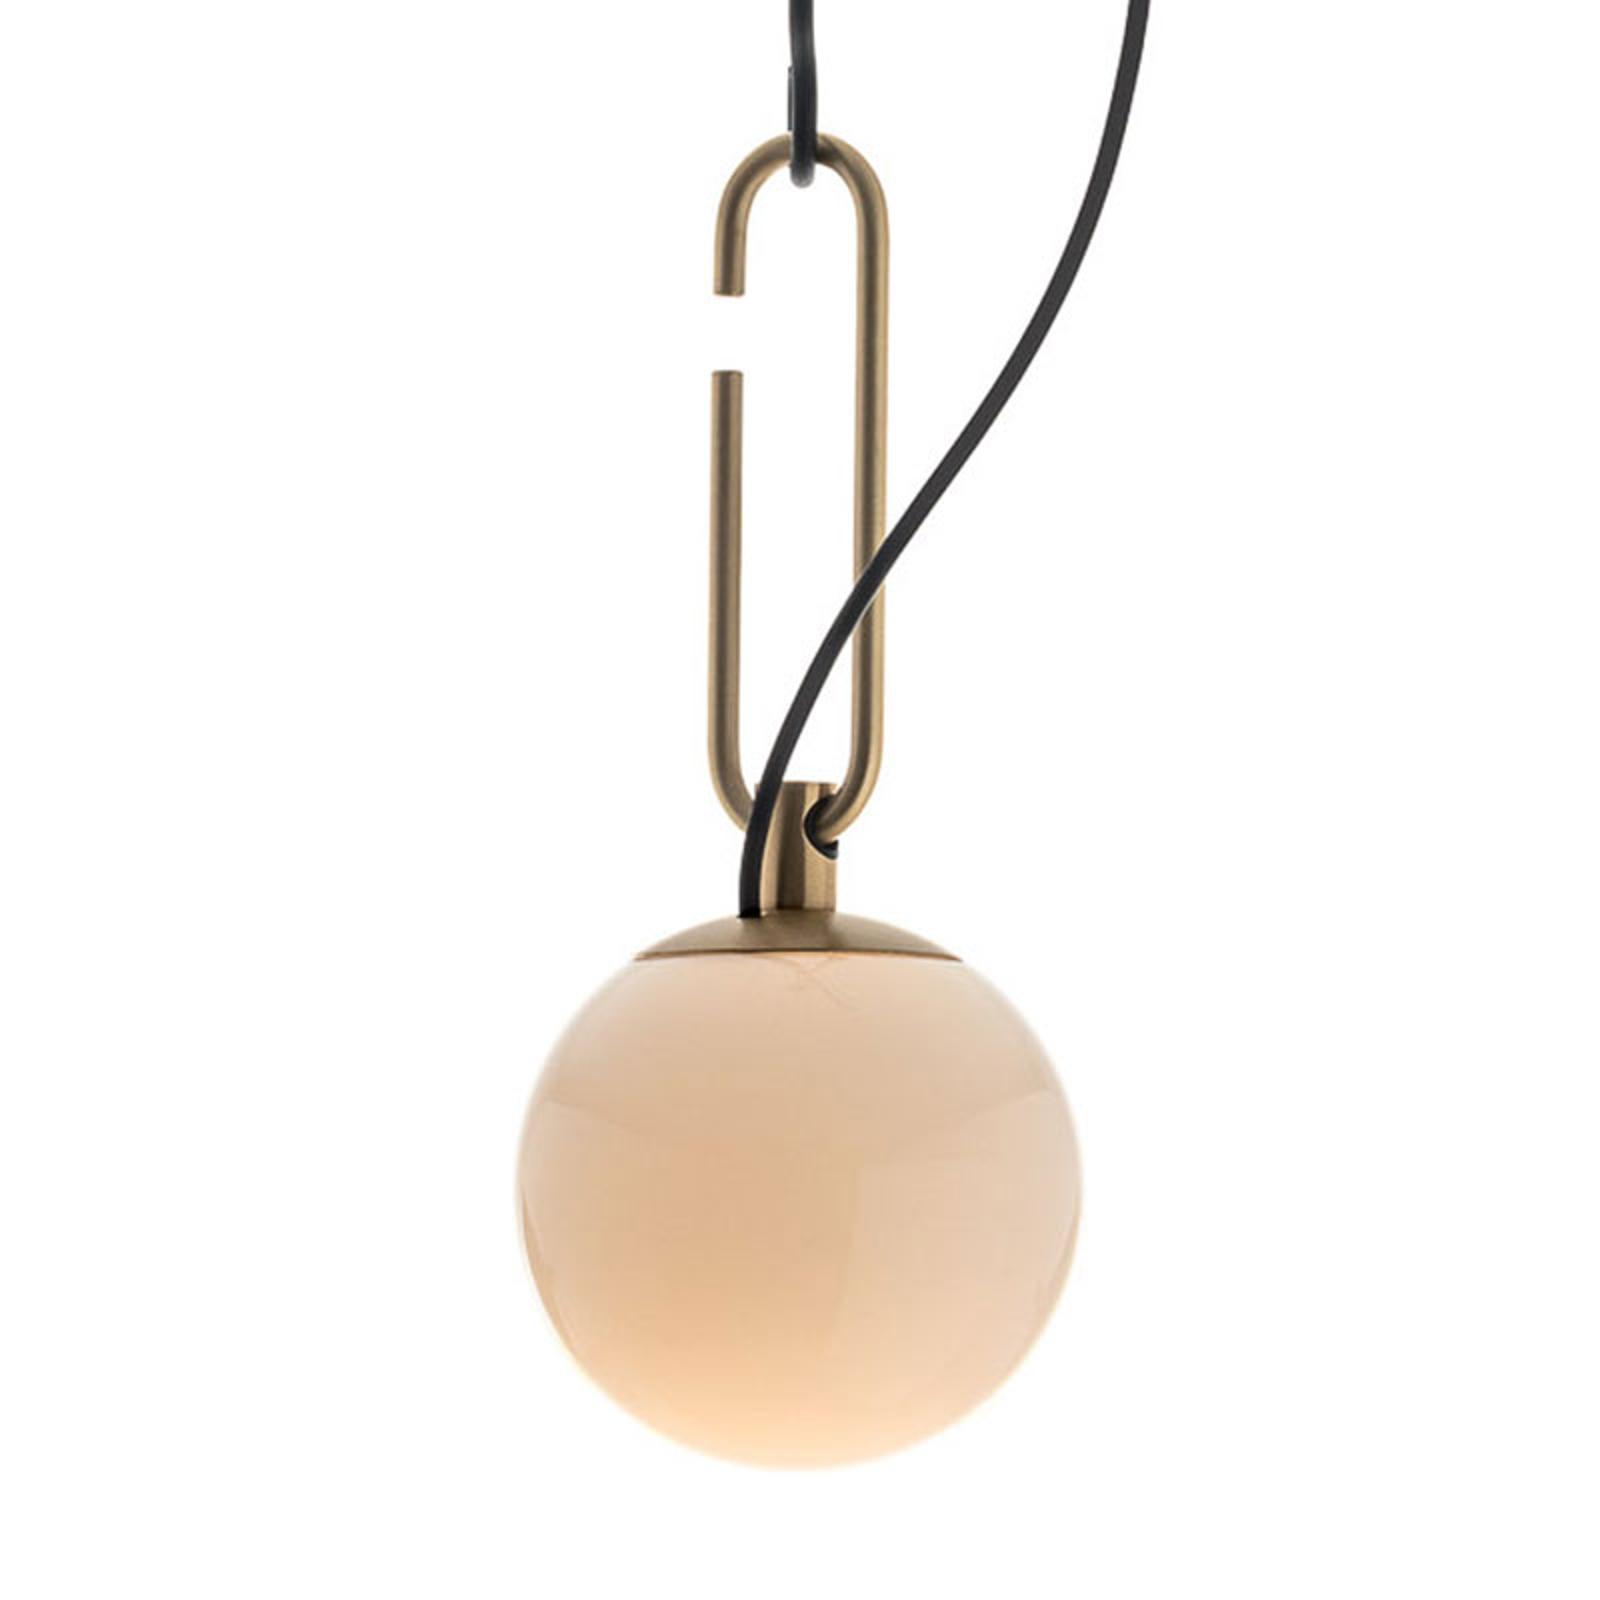 Artemide nh szklana lampa wisząca, Ø 14 cm